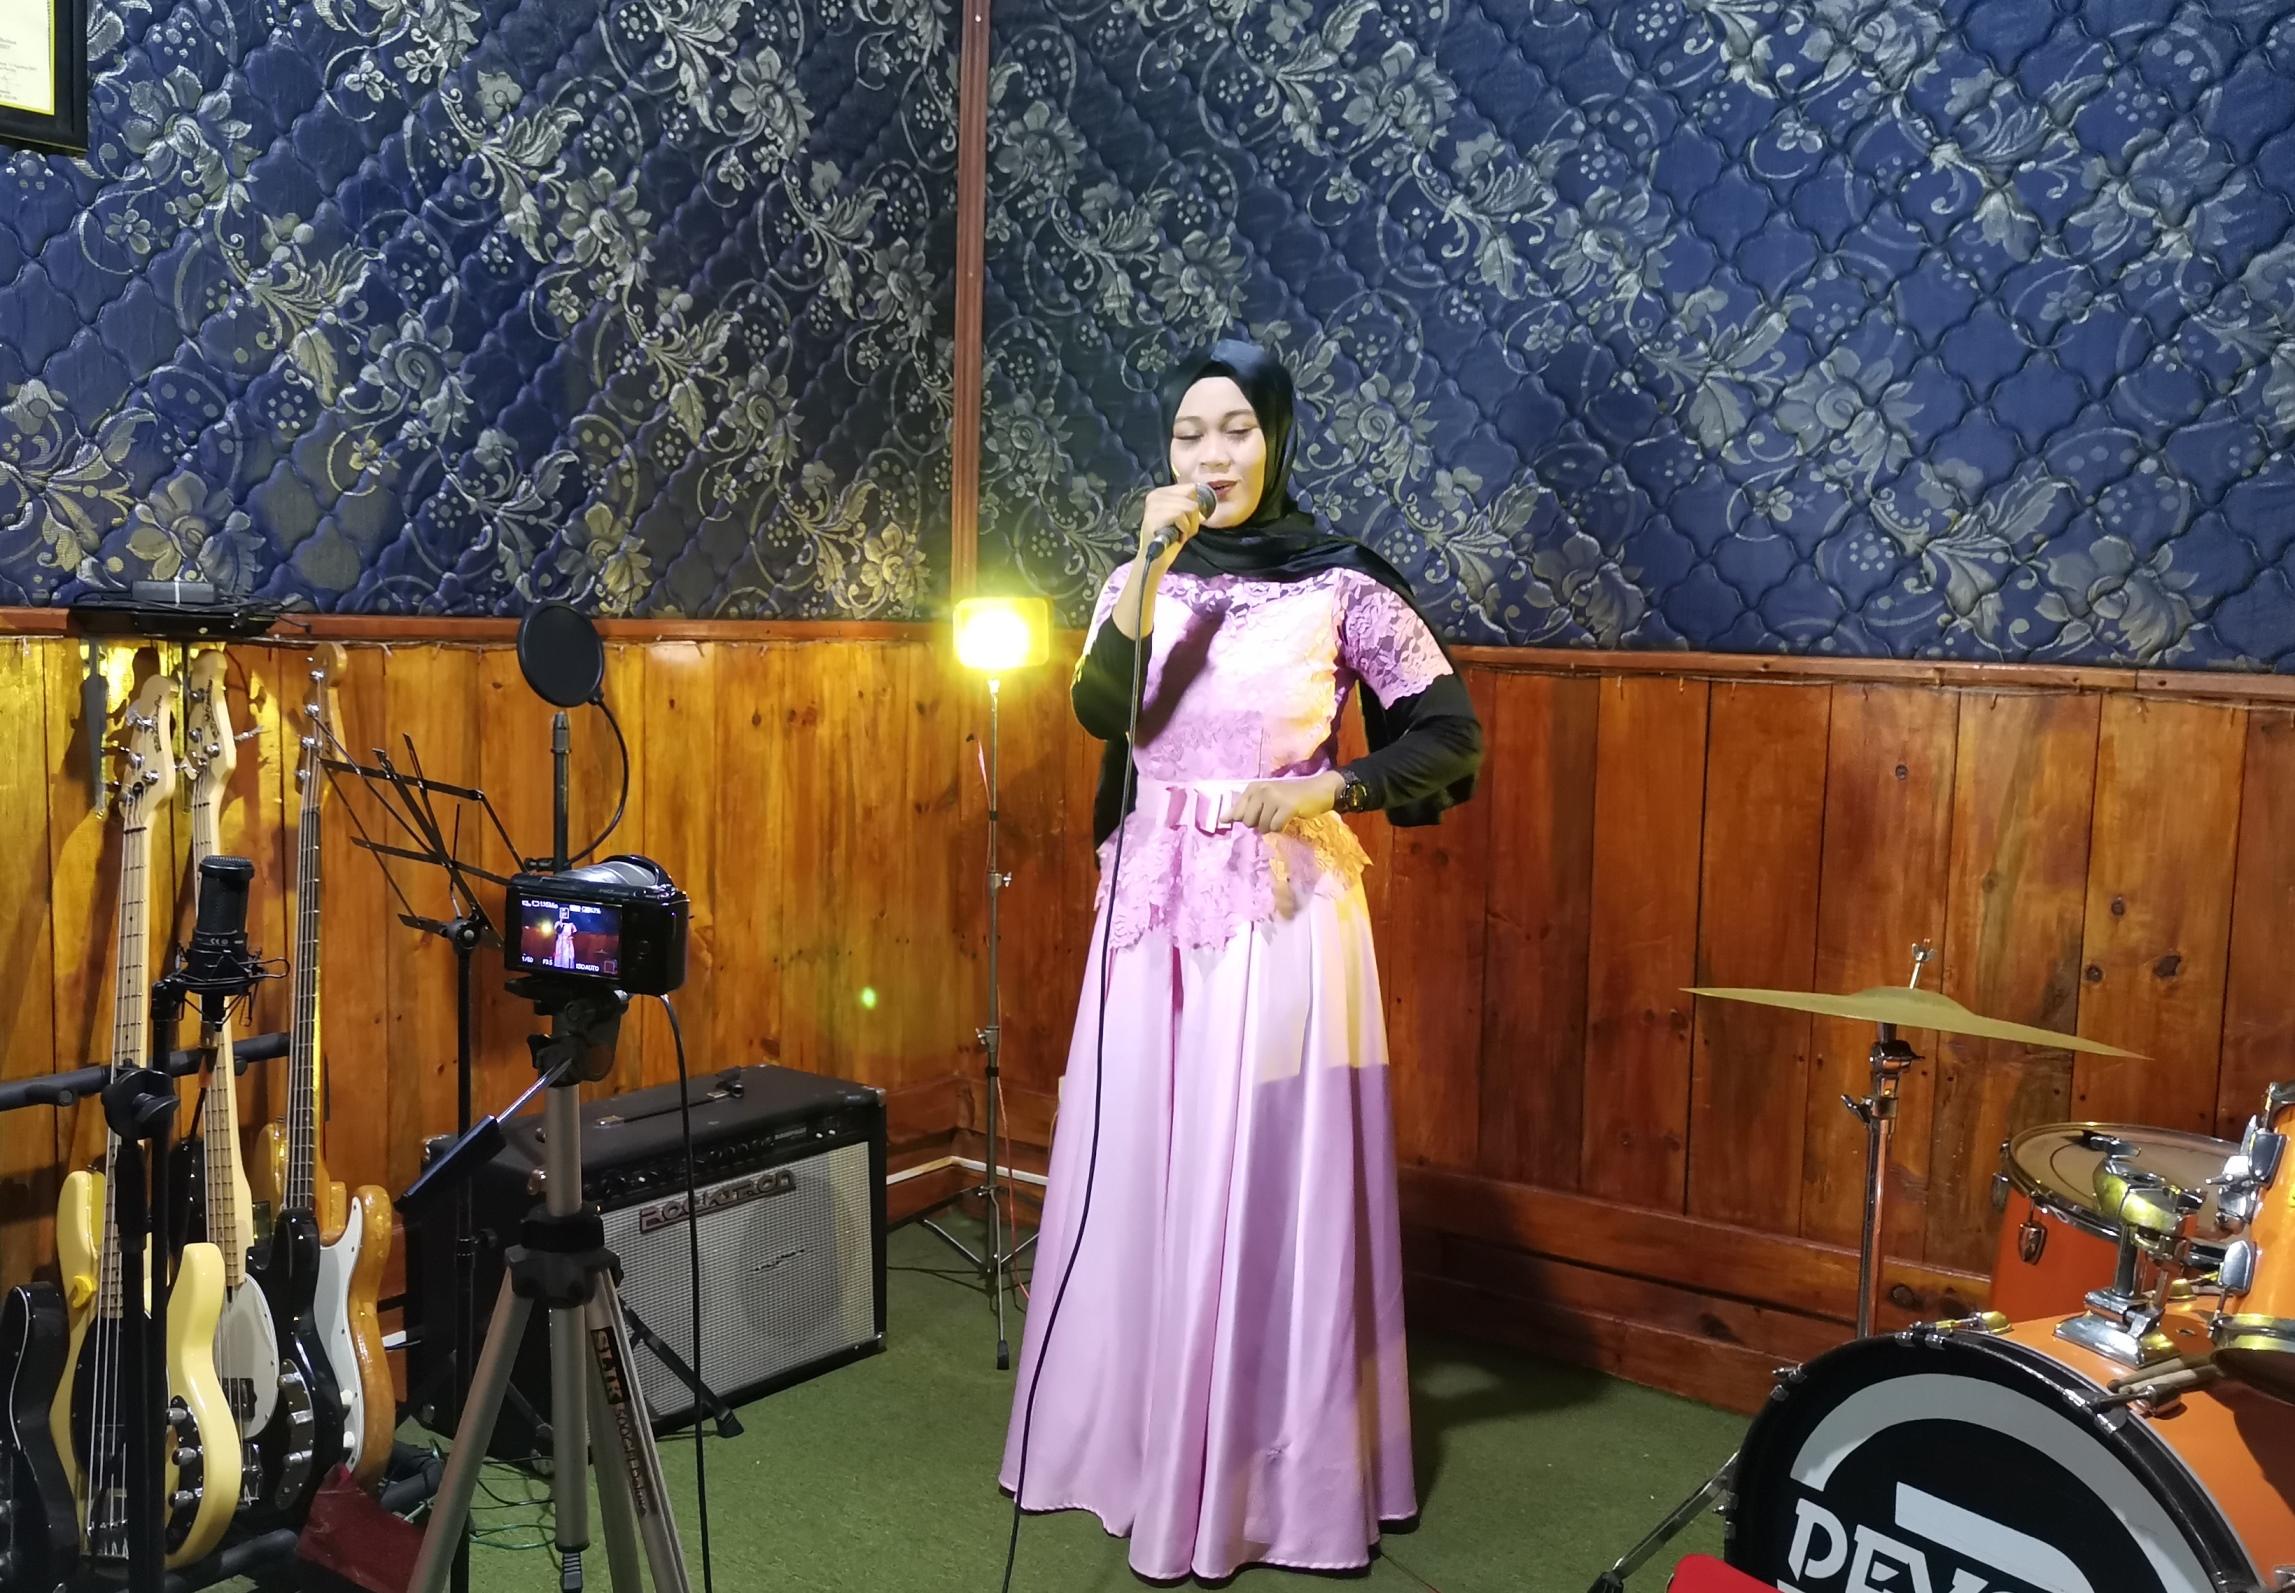 Rizqi Nurbaningtias rekaman untuk FLS2N